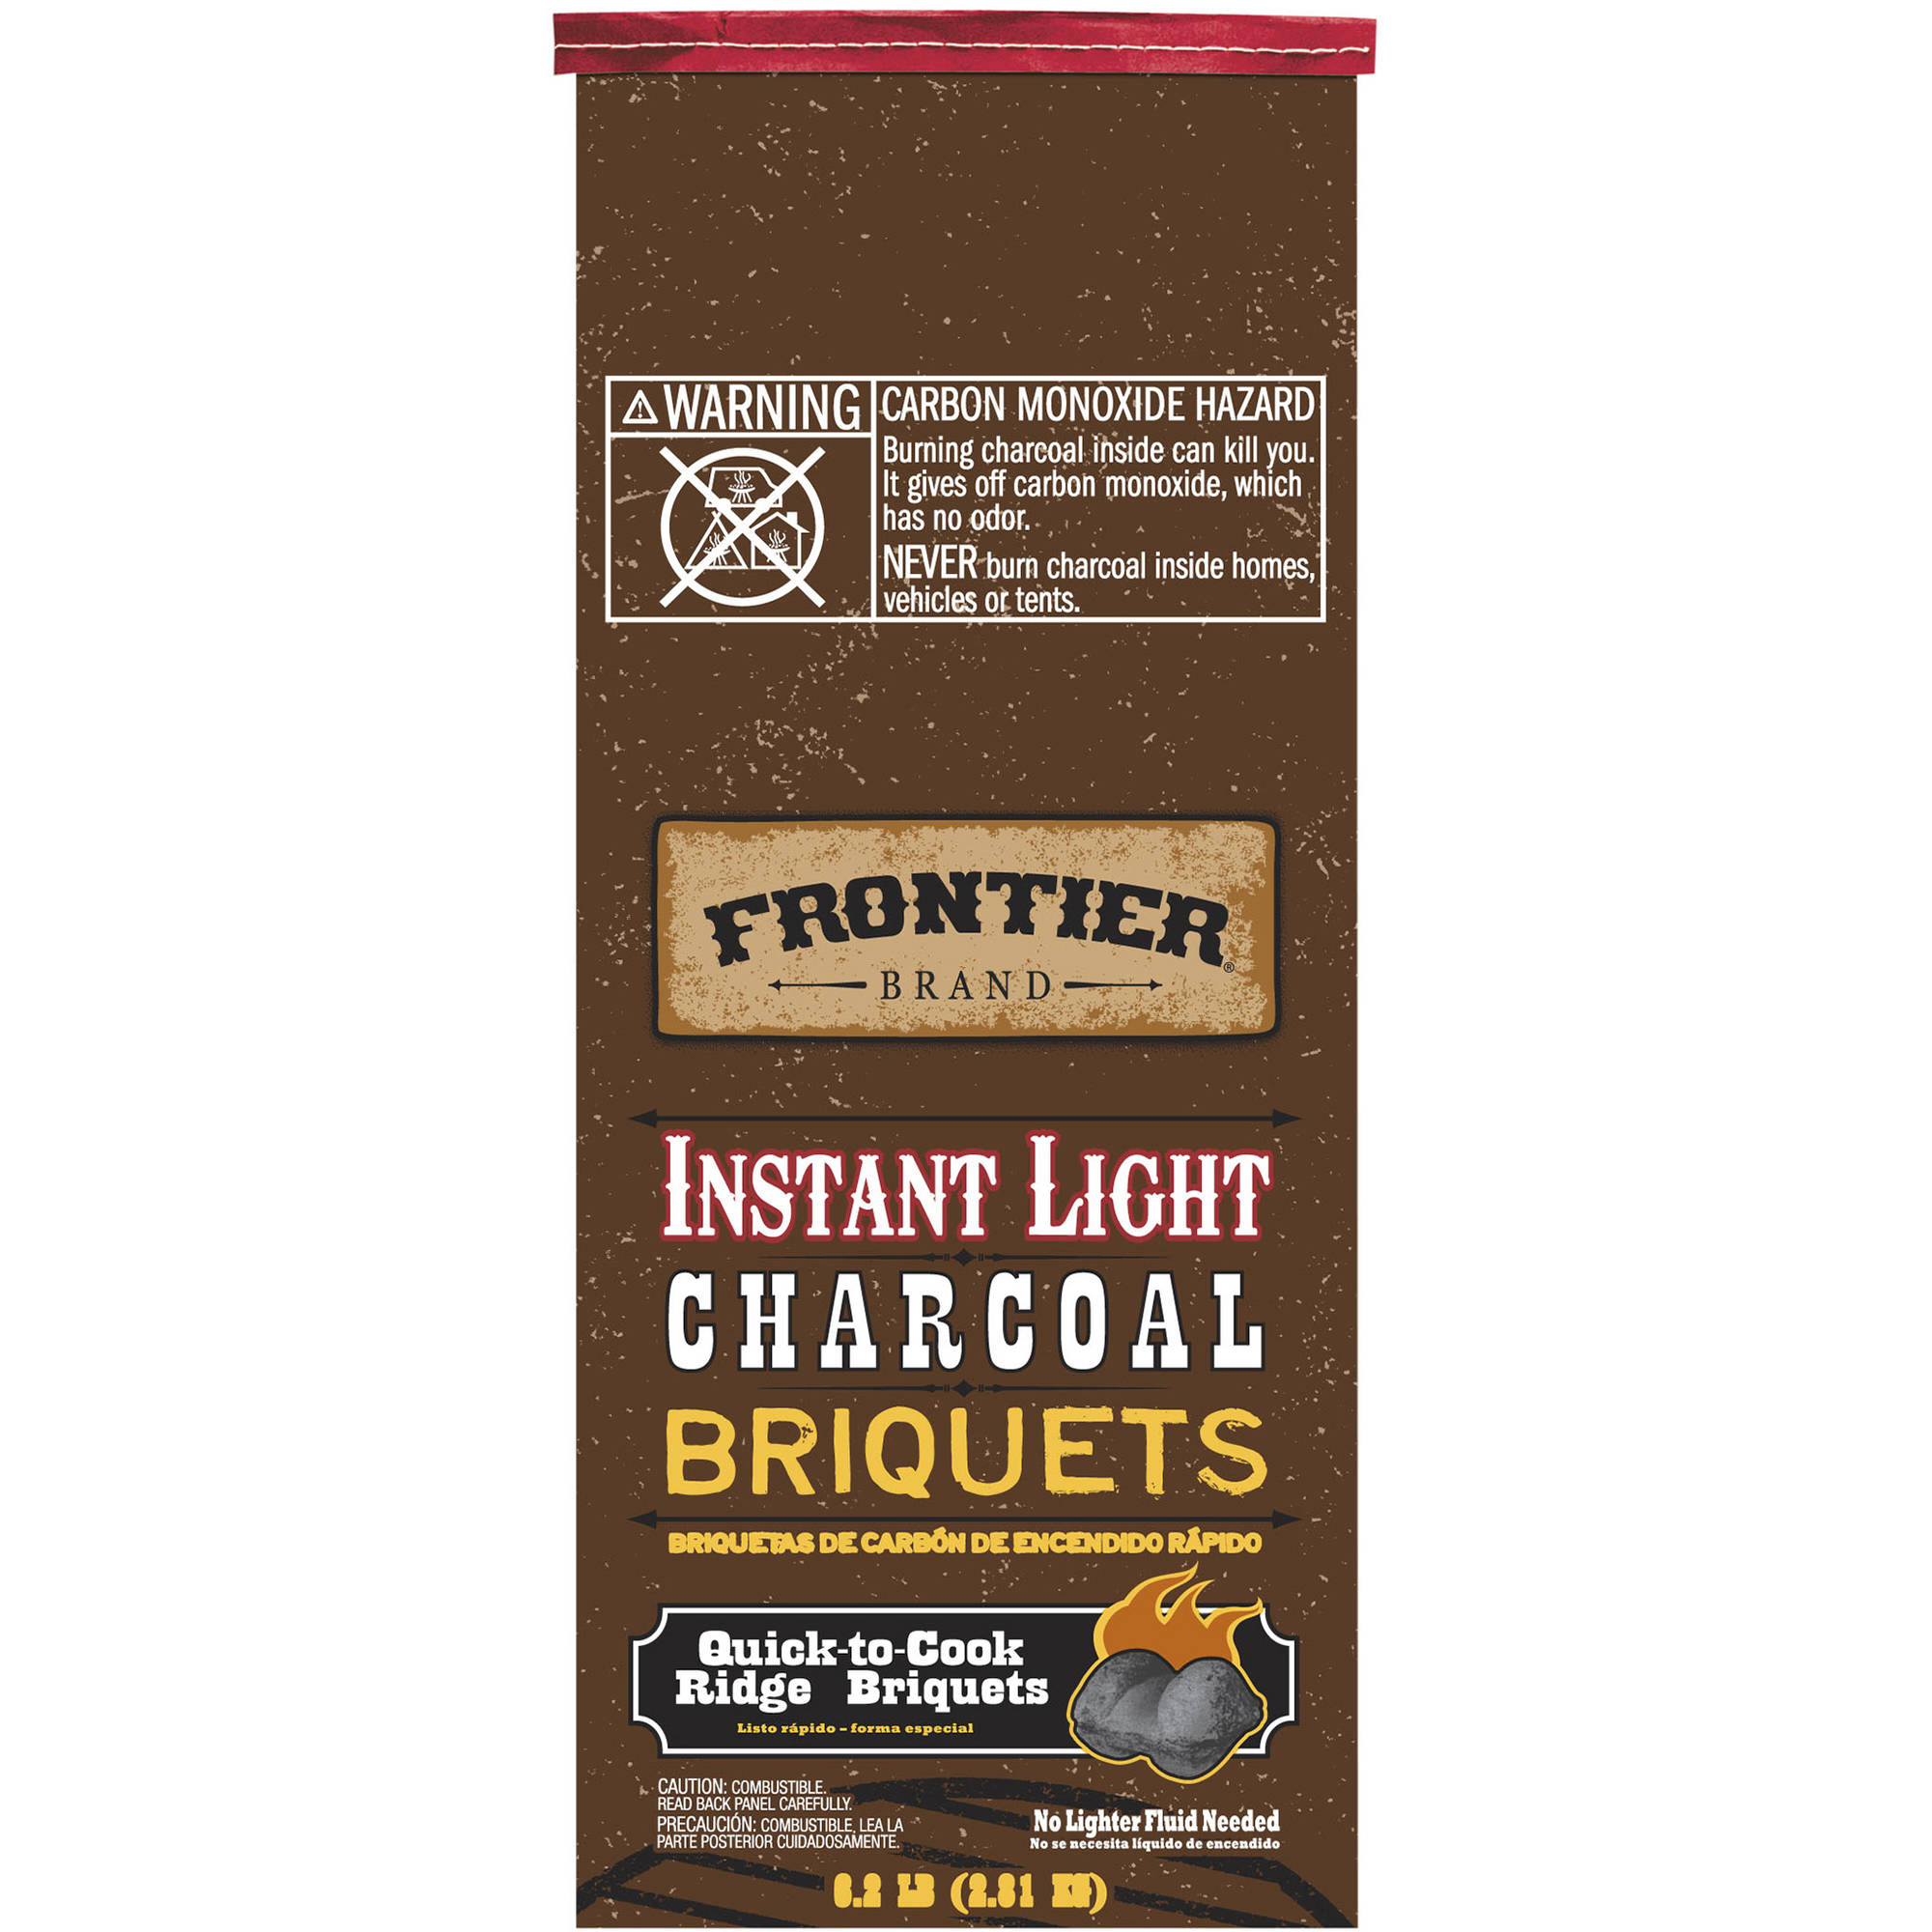 Frontier 198-330-128 6.2 lbs Instant Light Charcoal Briquets